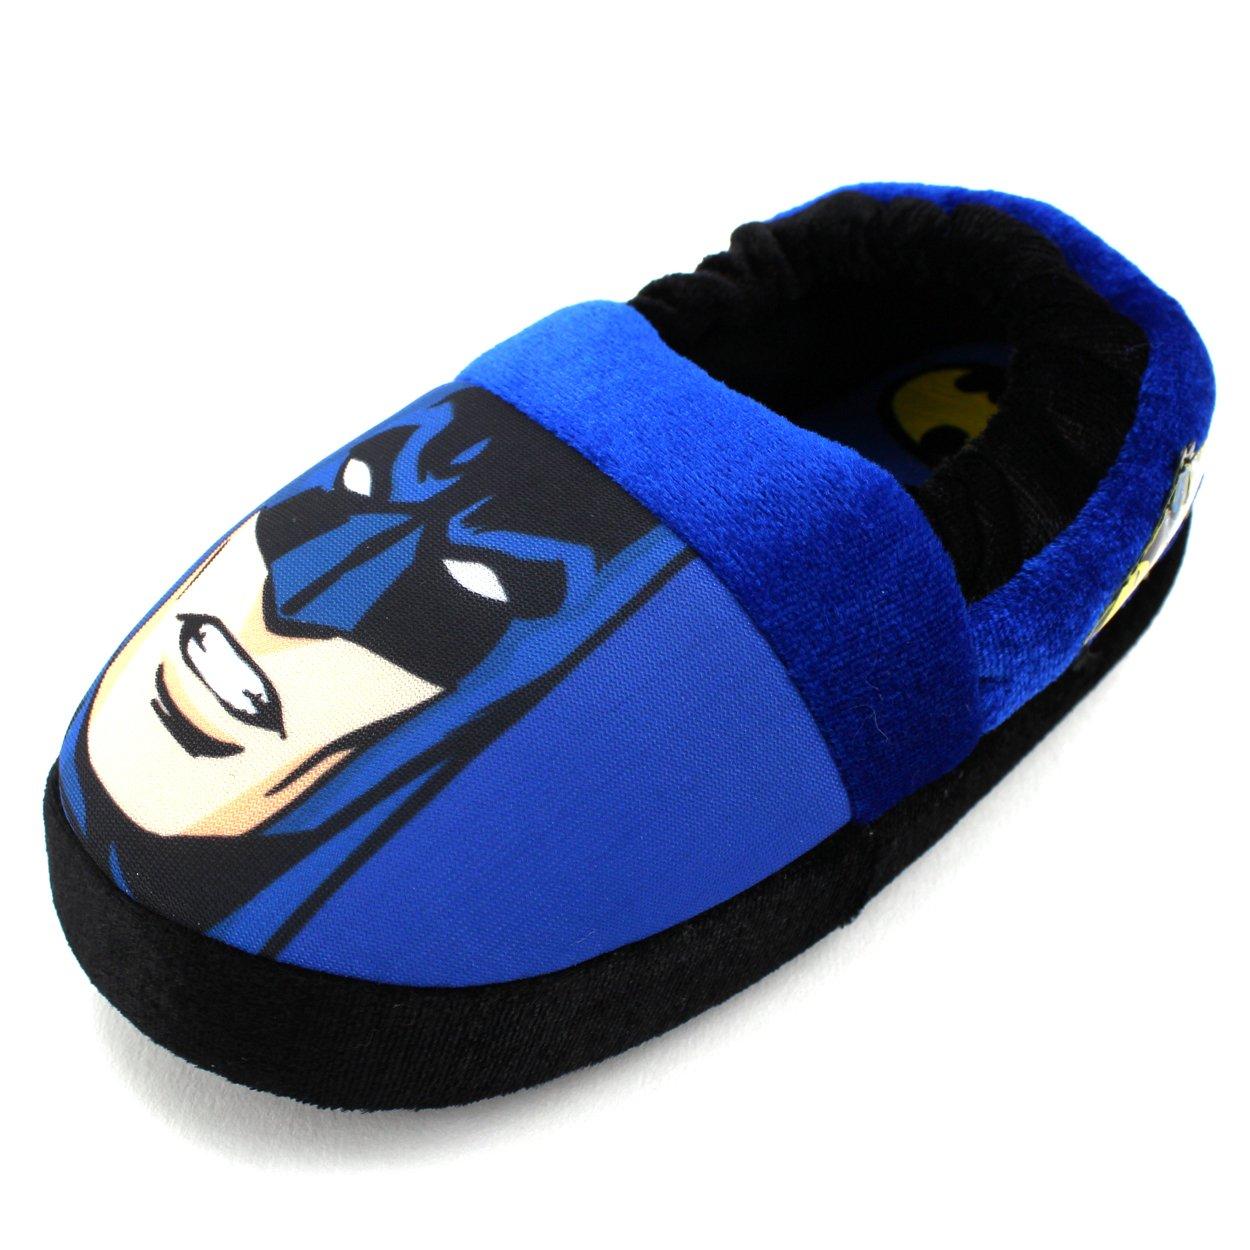 Batman Superhero Boys Aline Slippers (Toddler/Little Kid) manufacturer